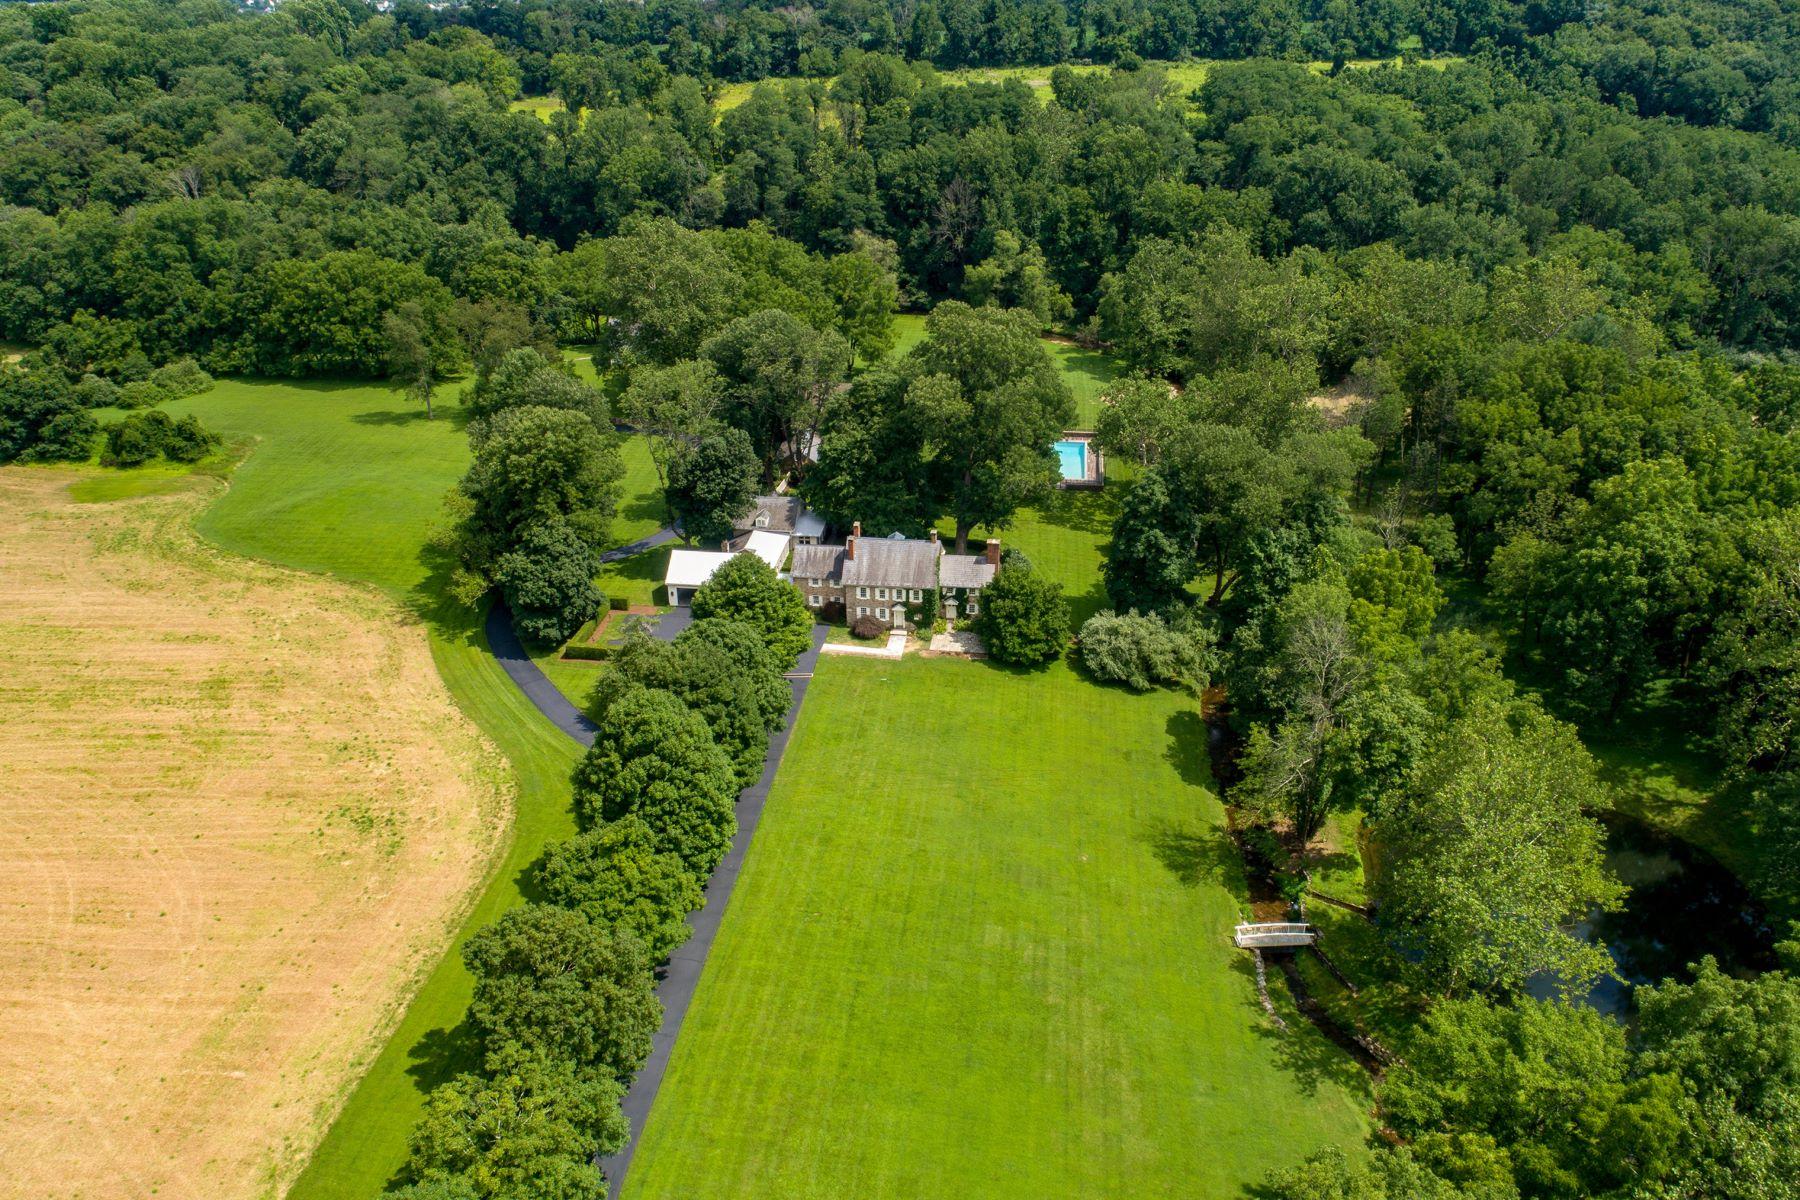 Single Family Homes για την Πώληση στο Finale Farm 6550 MEETINGHOUSE RD, New Hope, Πενσιλβανια 18938 Ηνωμένες Πολιτείες